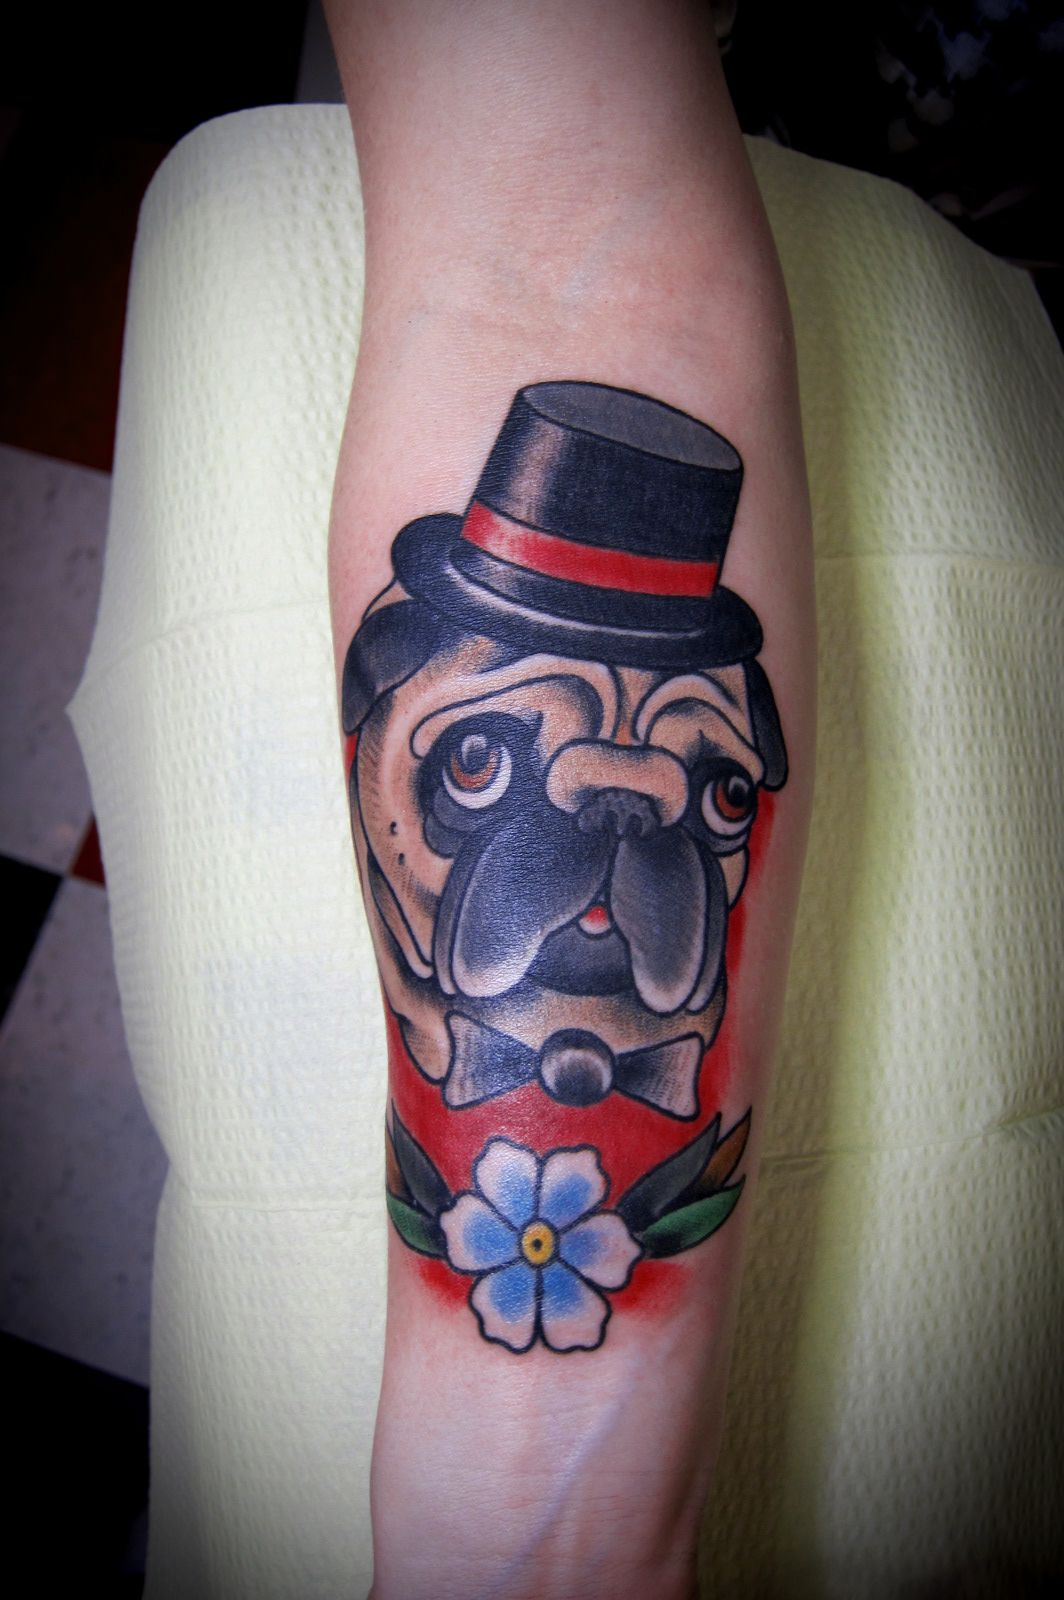 Pin by Katie Lawless on Inkspiration | Pinterest | Tattoo